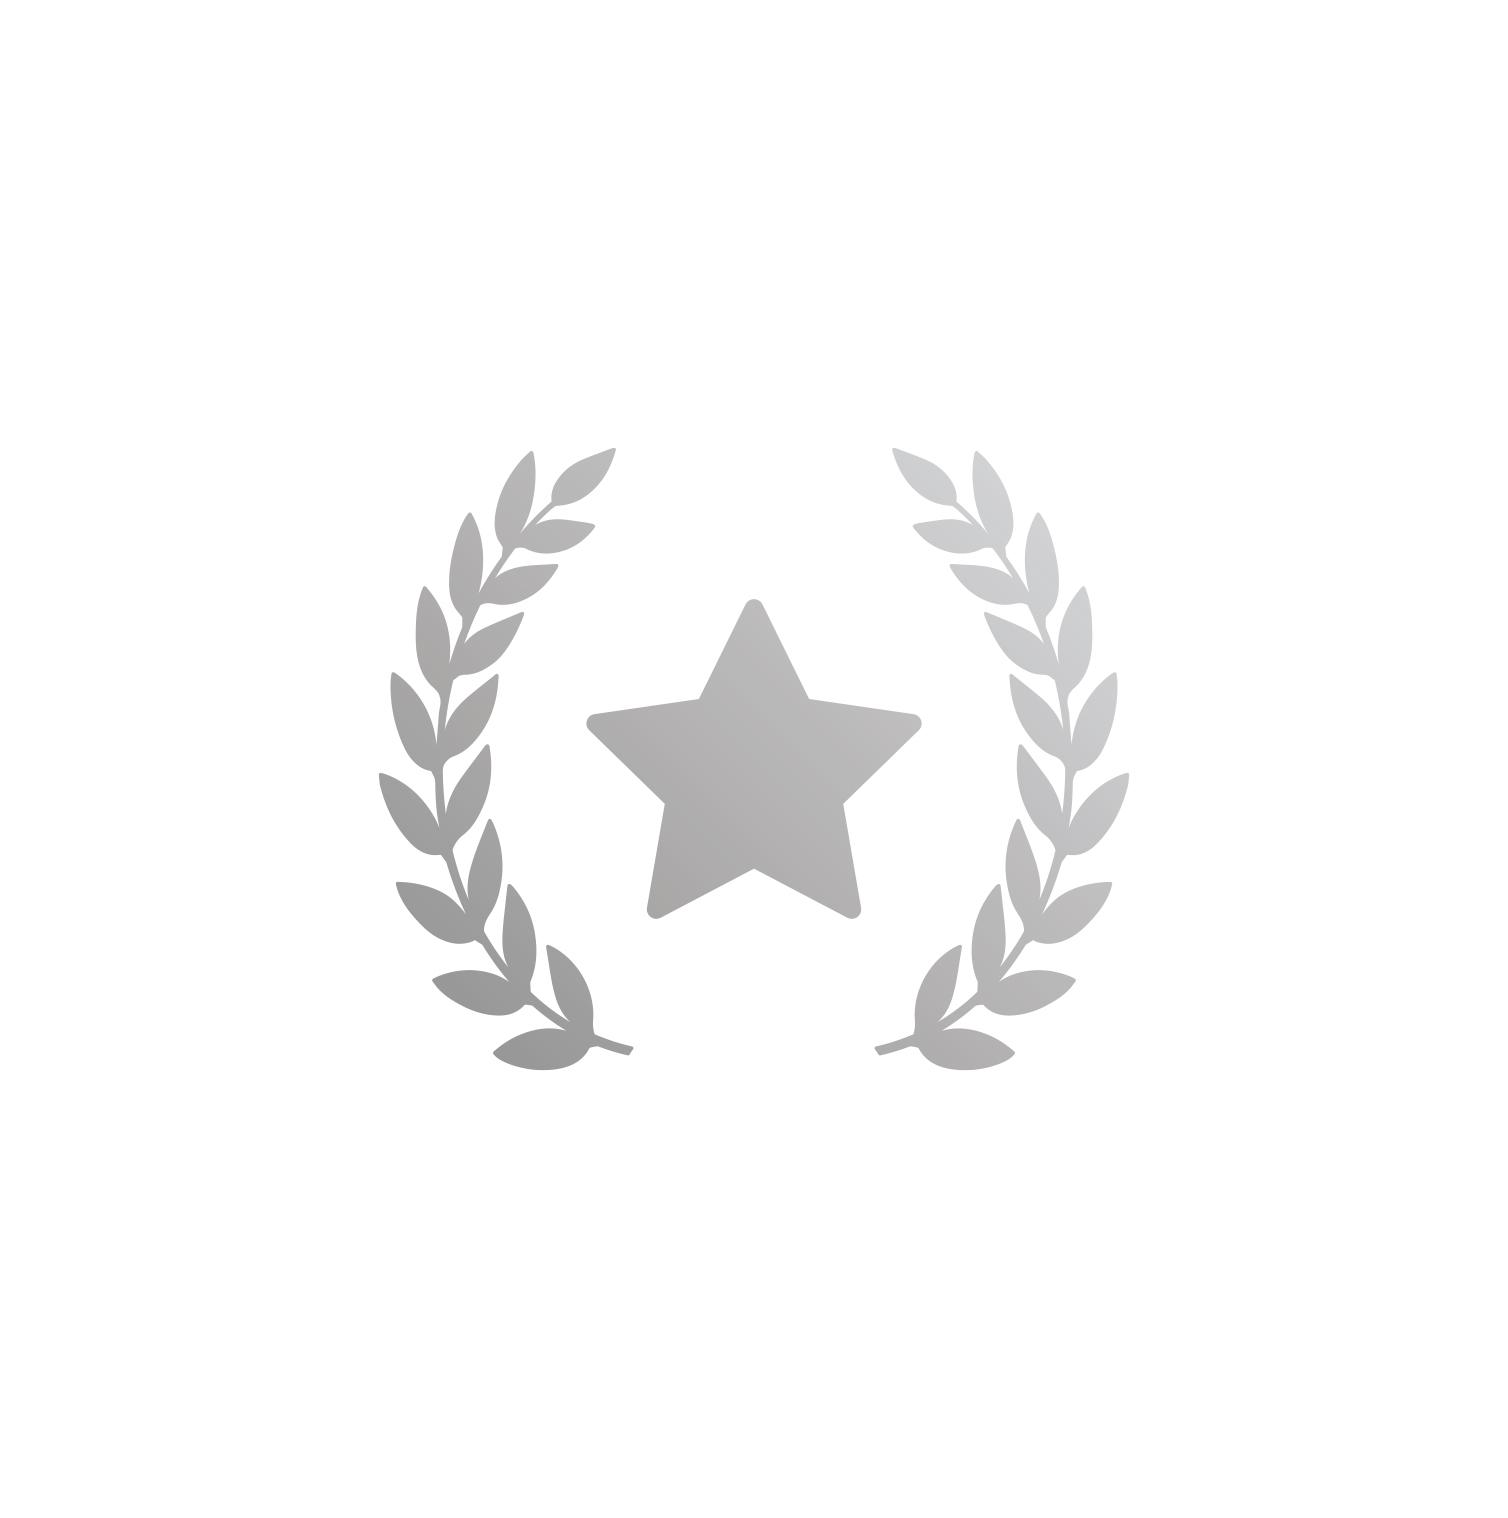 Elite Personal Training - Website Rebuild Project - Working v2-4.jpg